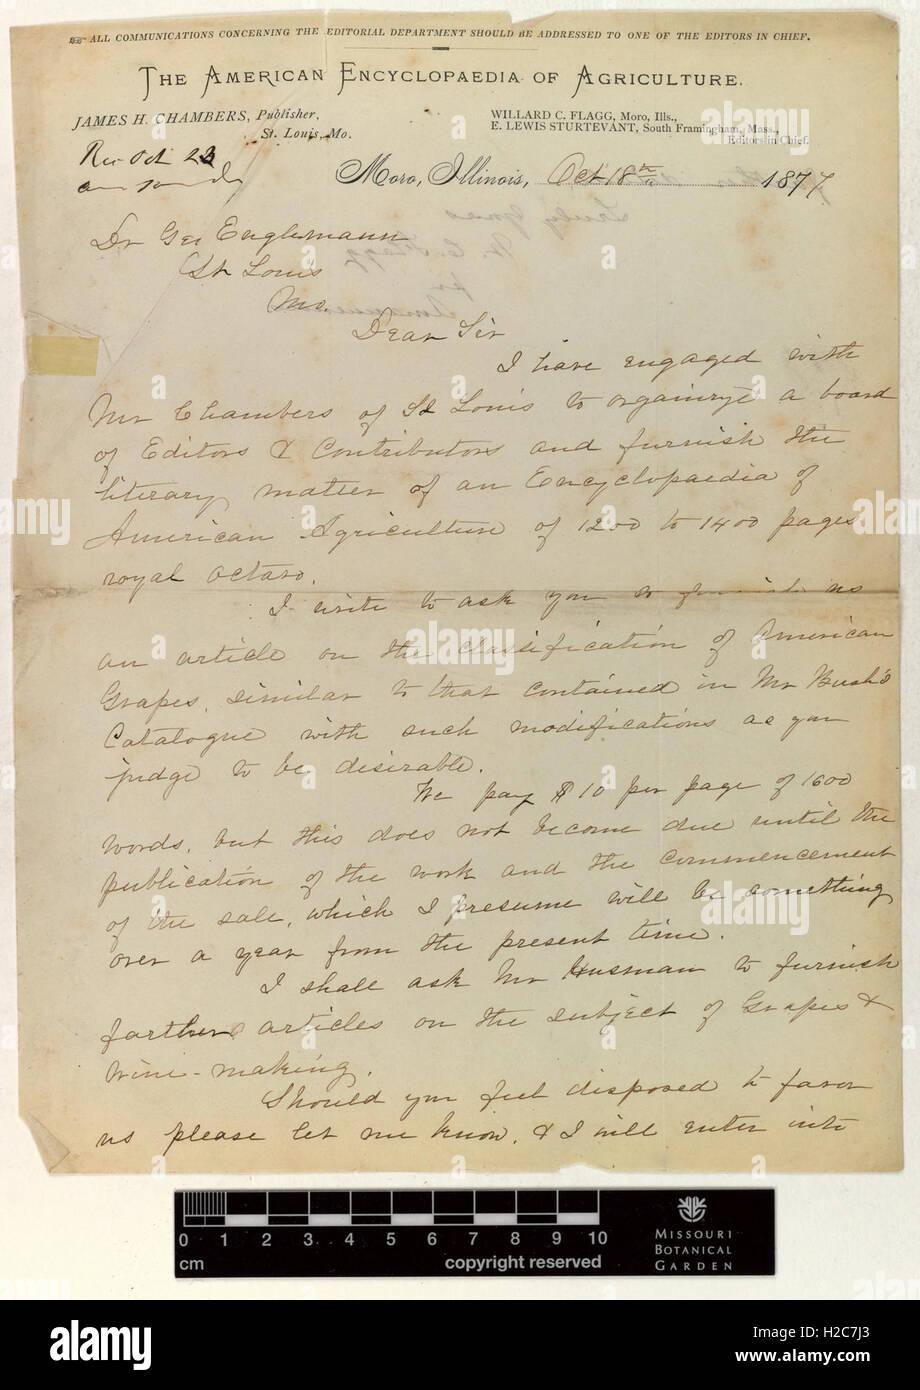 18 1877 Stock Photos & 18 1877 Stock Images - Alamy